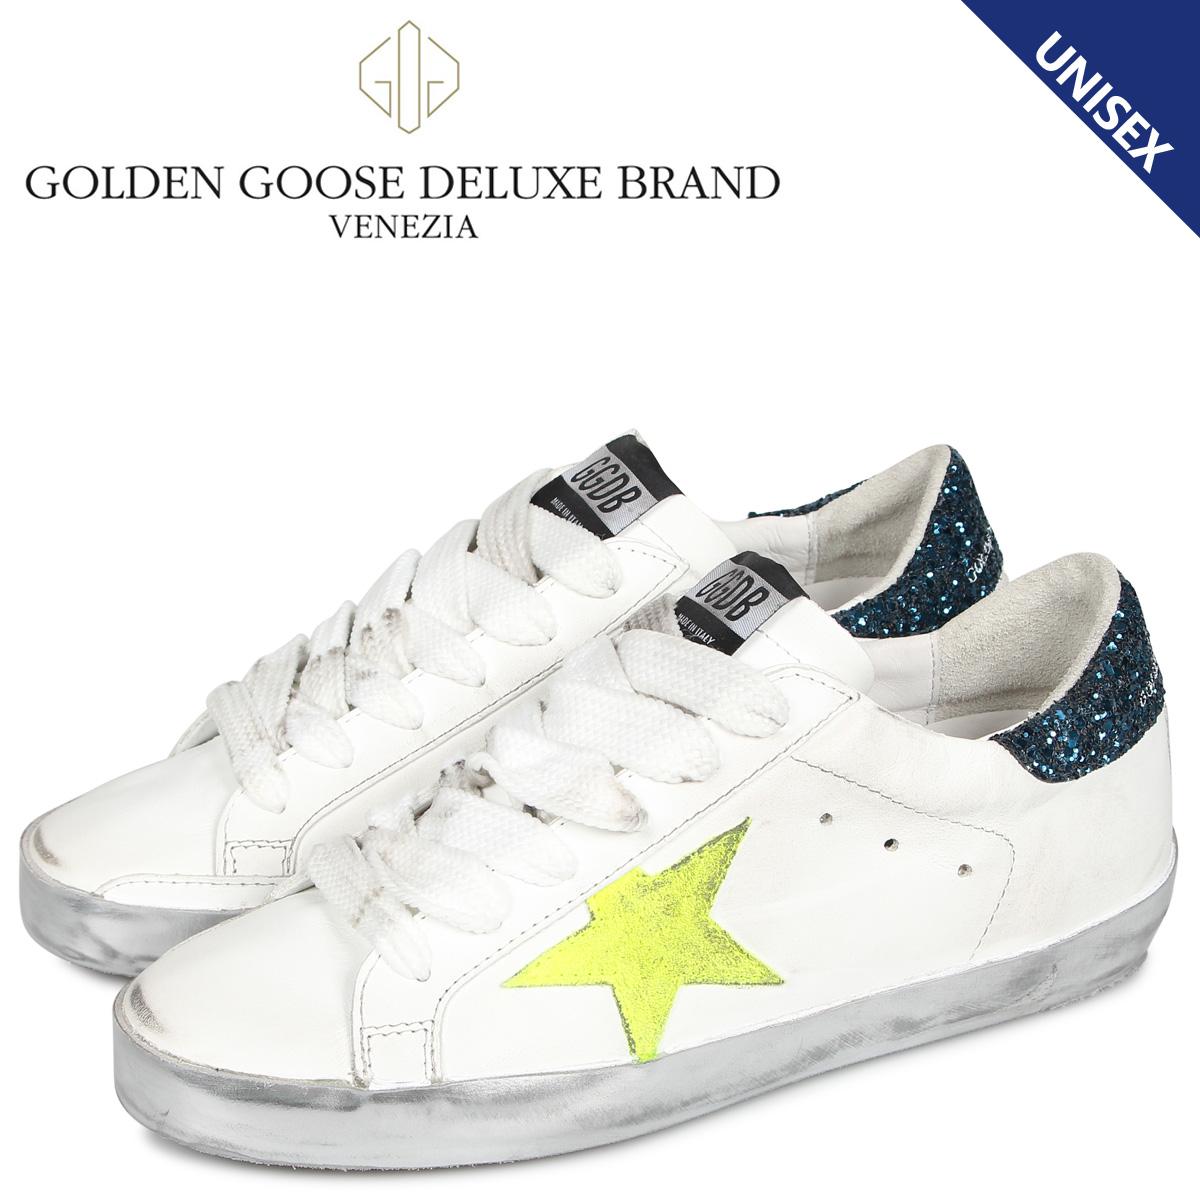 Golden Goose ゴールデングース スーパースター スニーカー メンズ レディース SUPERSTAR ホワイト 白 G35WS590 R49